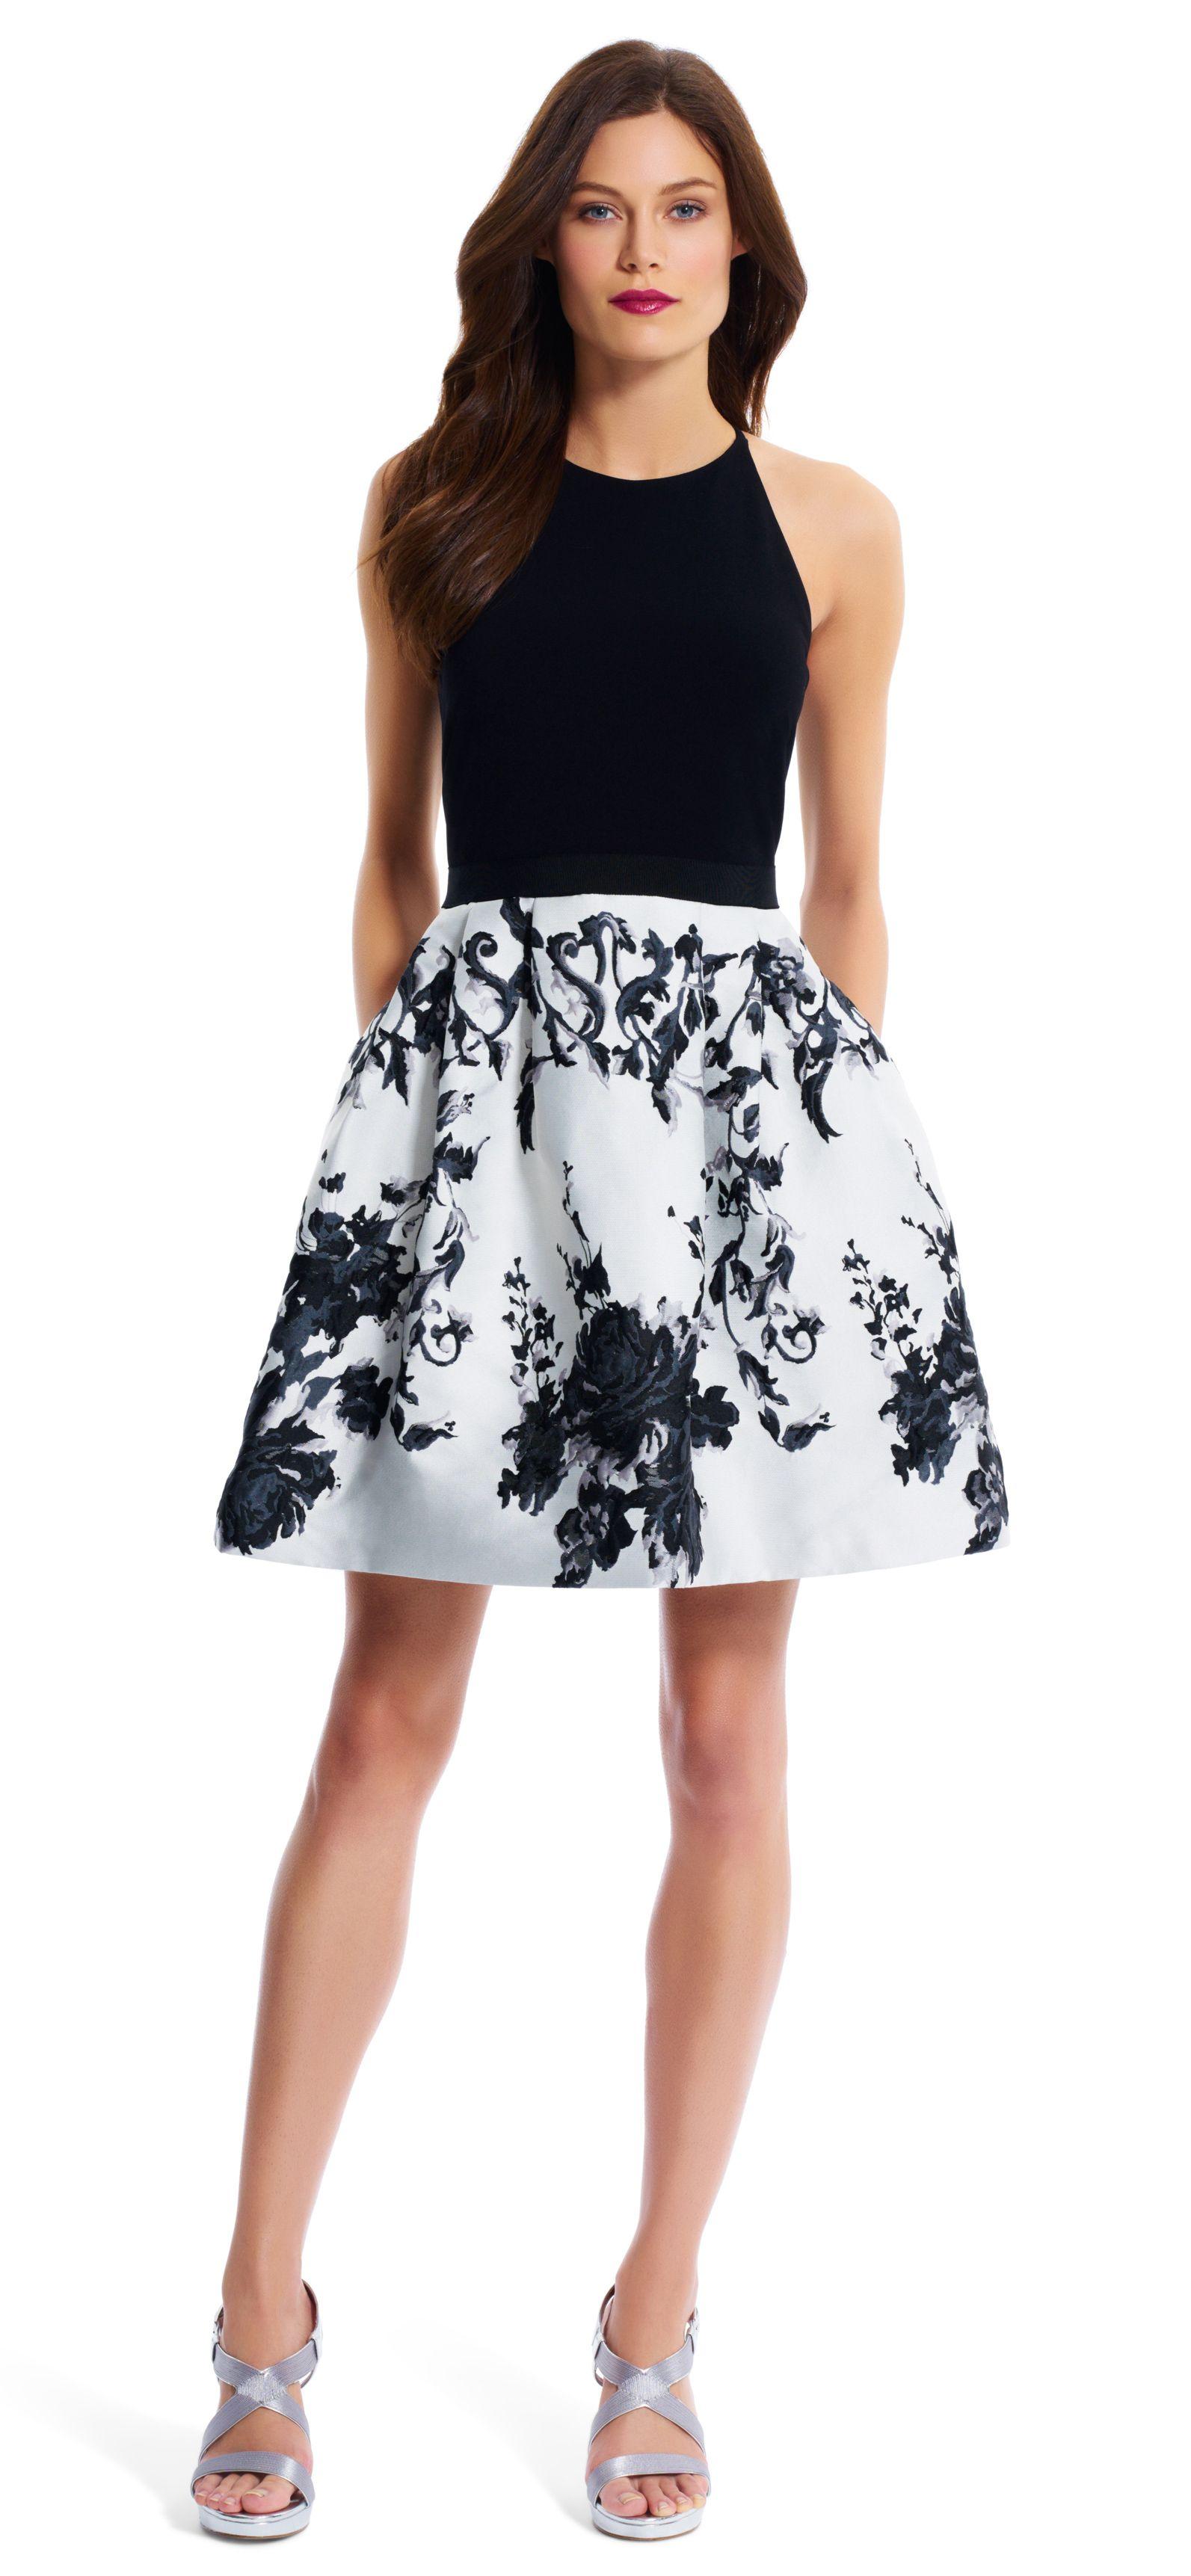 Mixed media halter party dress - Adrianna Papell | Party Dress ...